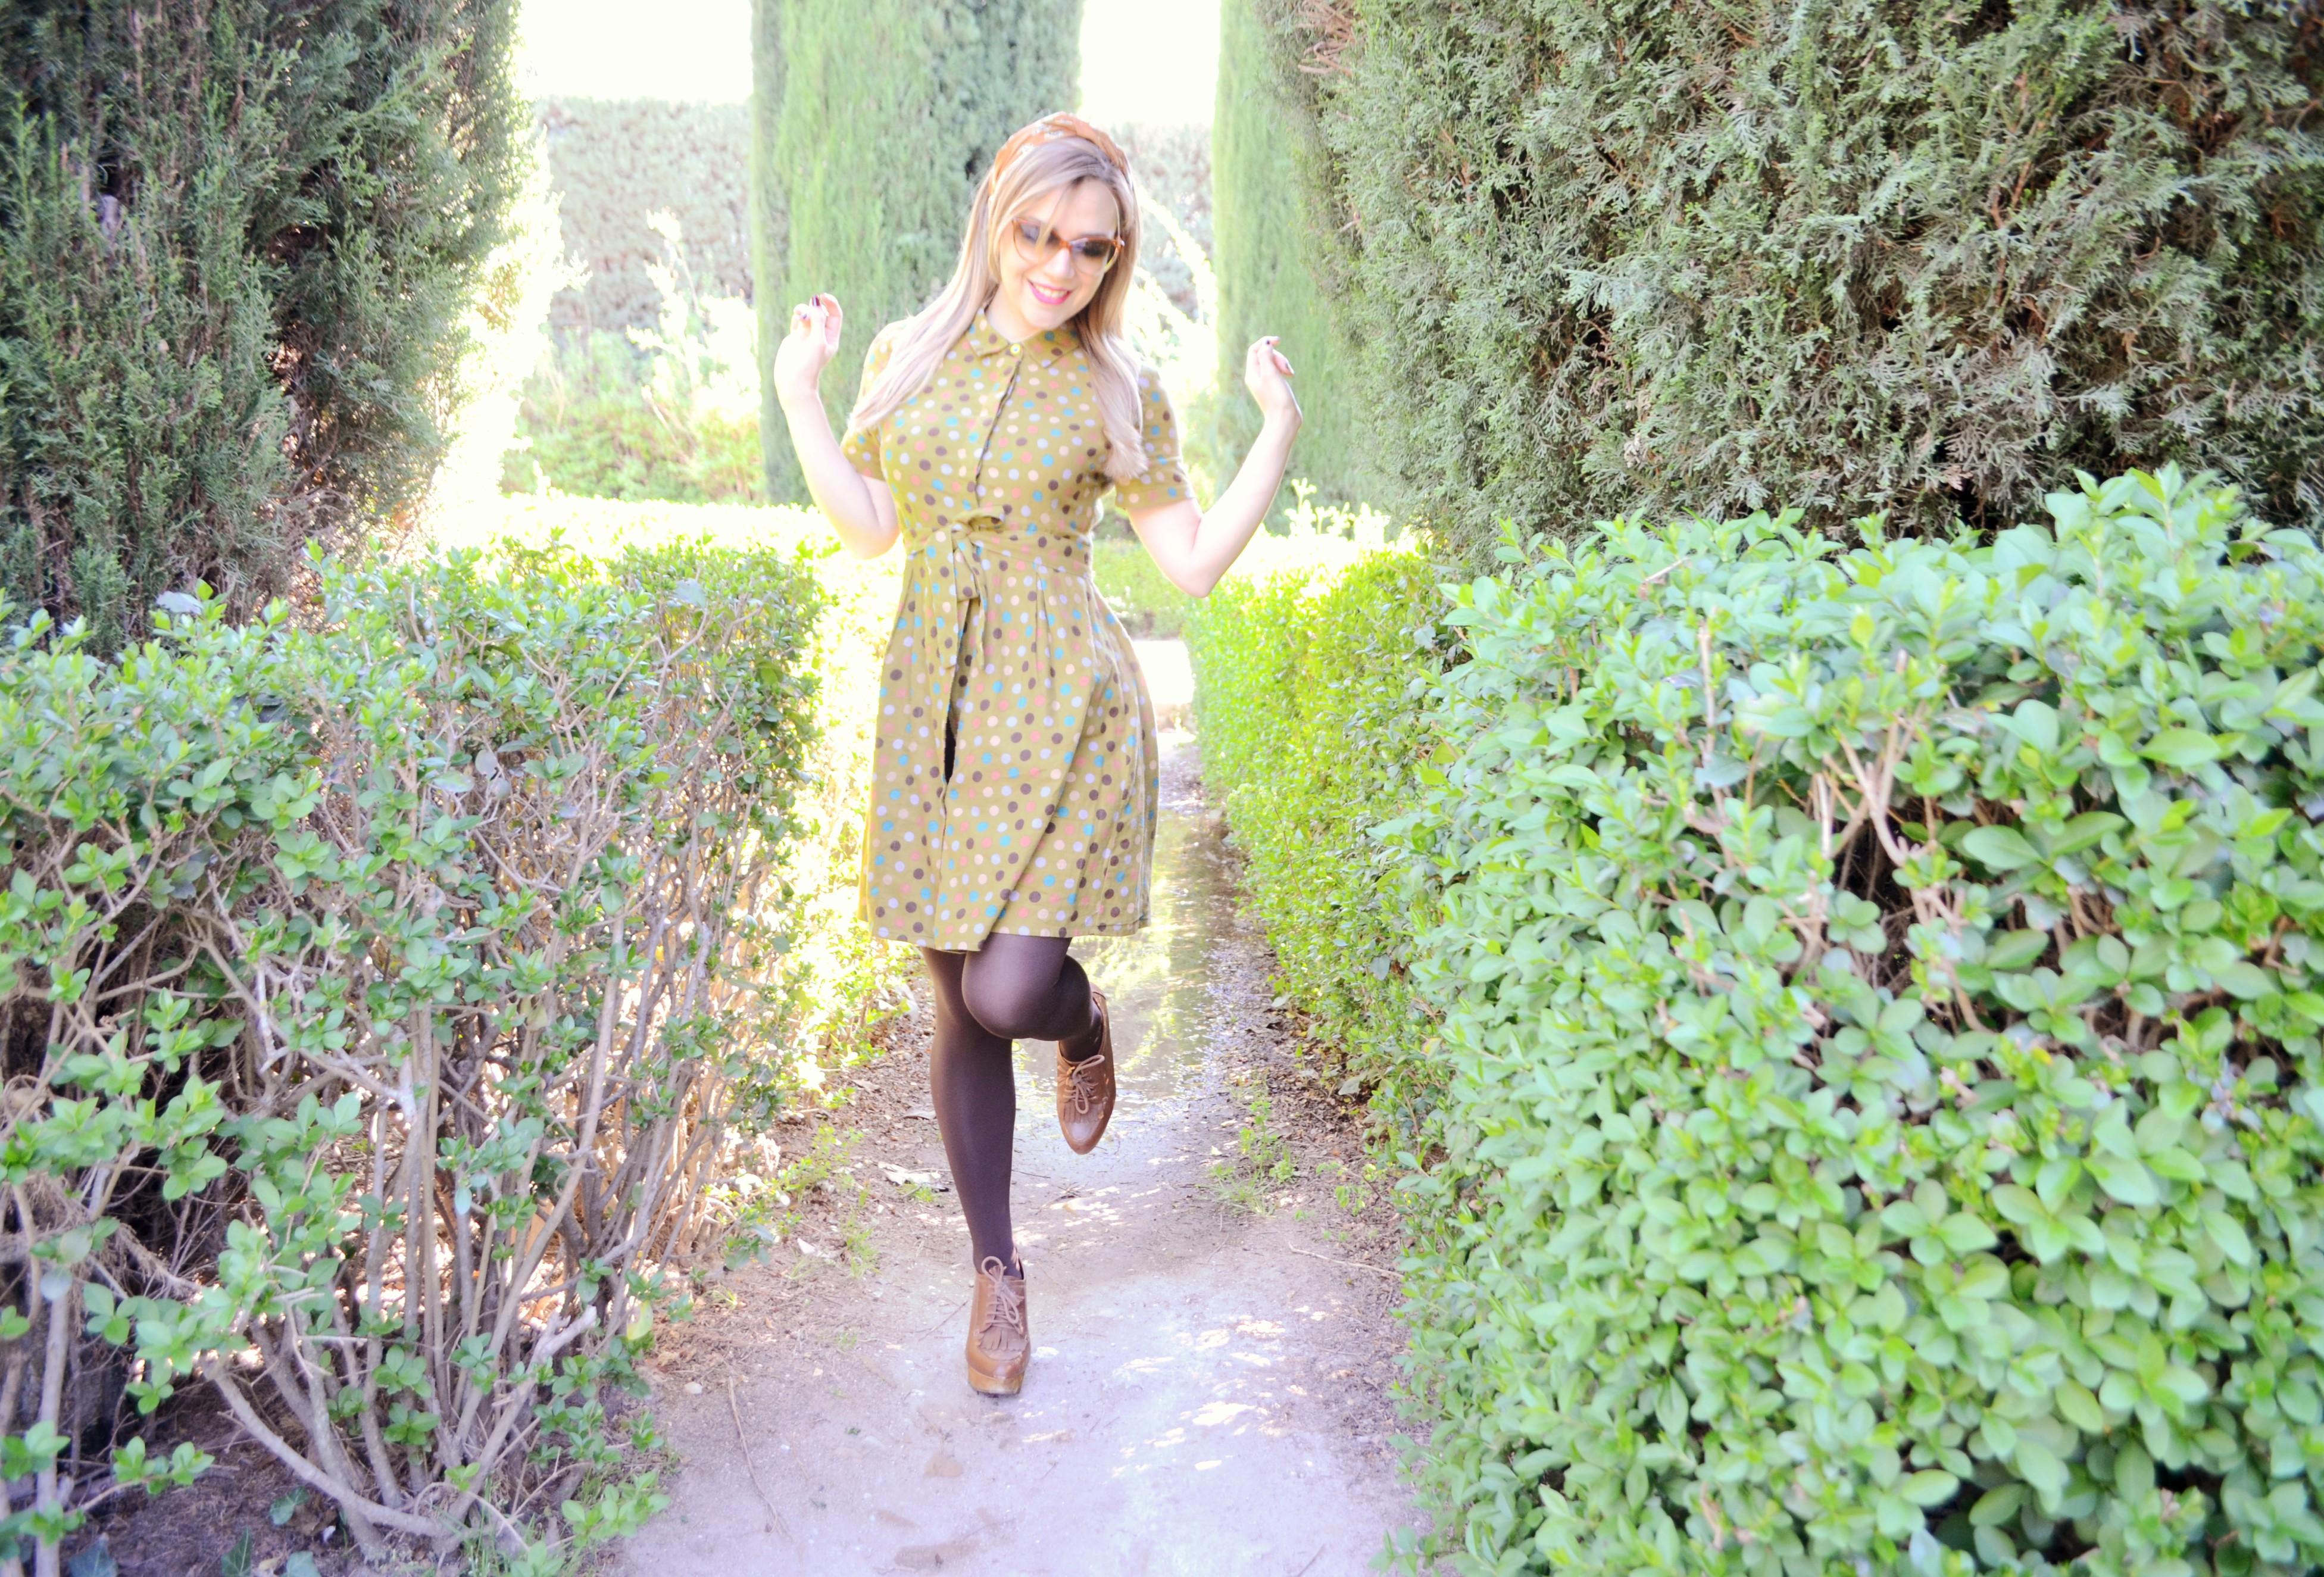 ChicAdicta-blog-de-moda-fashionista-Chic-Adicta-vestido-de-lunares-polkadot-dress-influencer-retro-style-PiensaenChic-Piensa-en-Chic